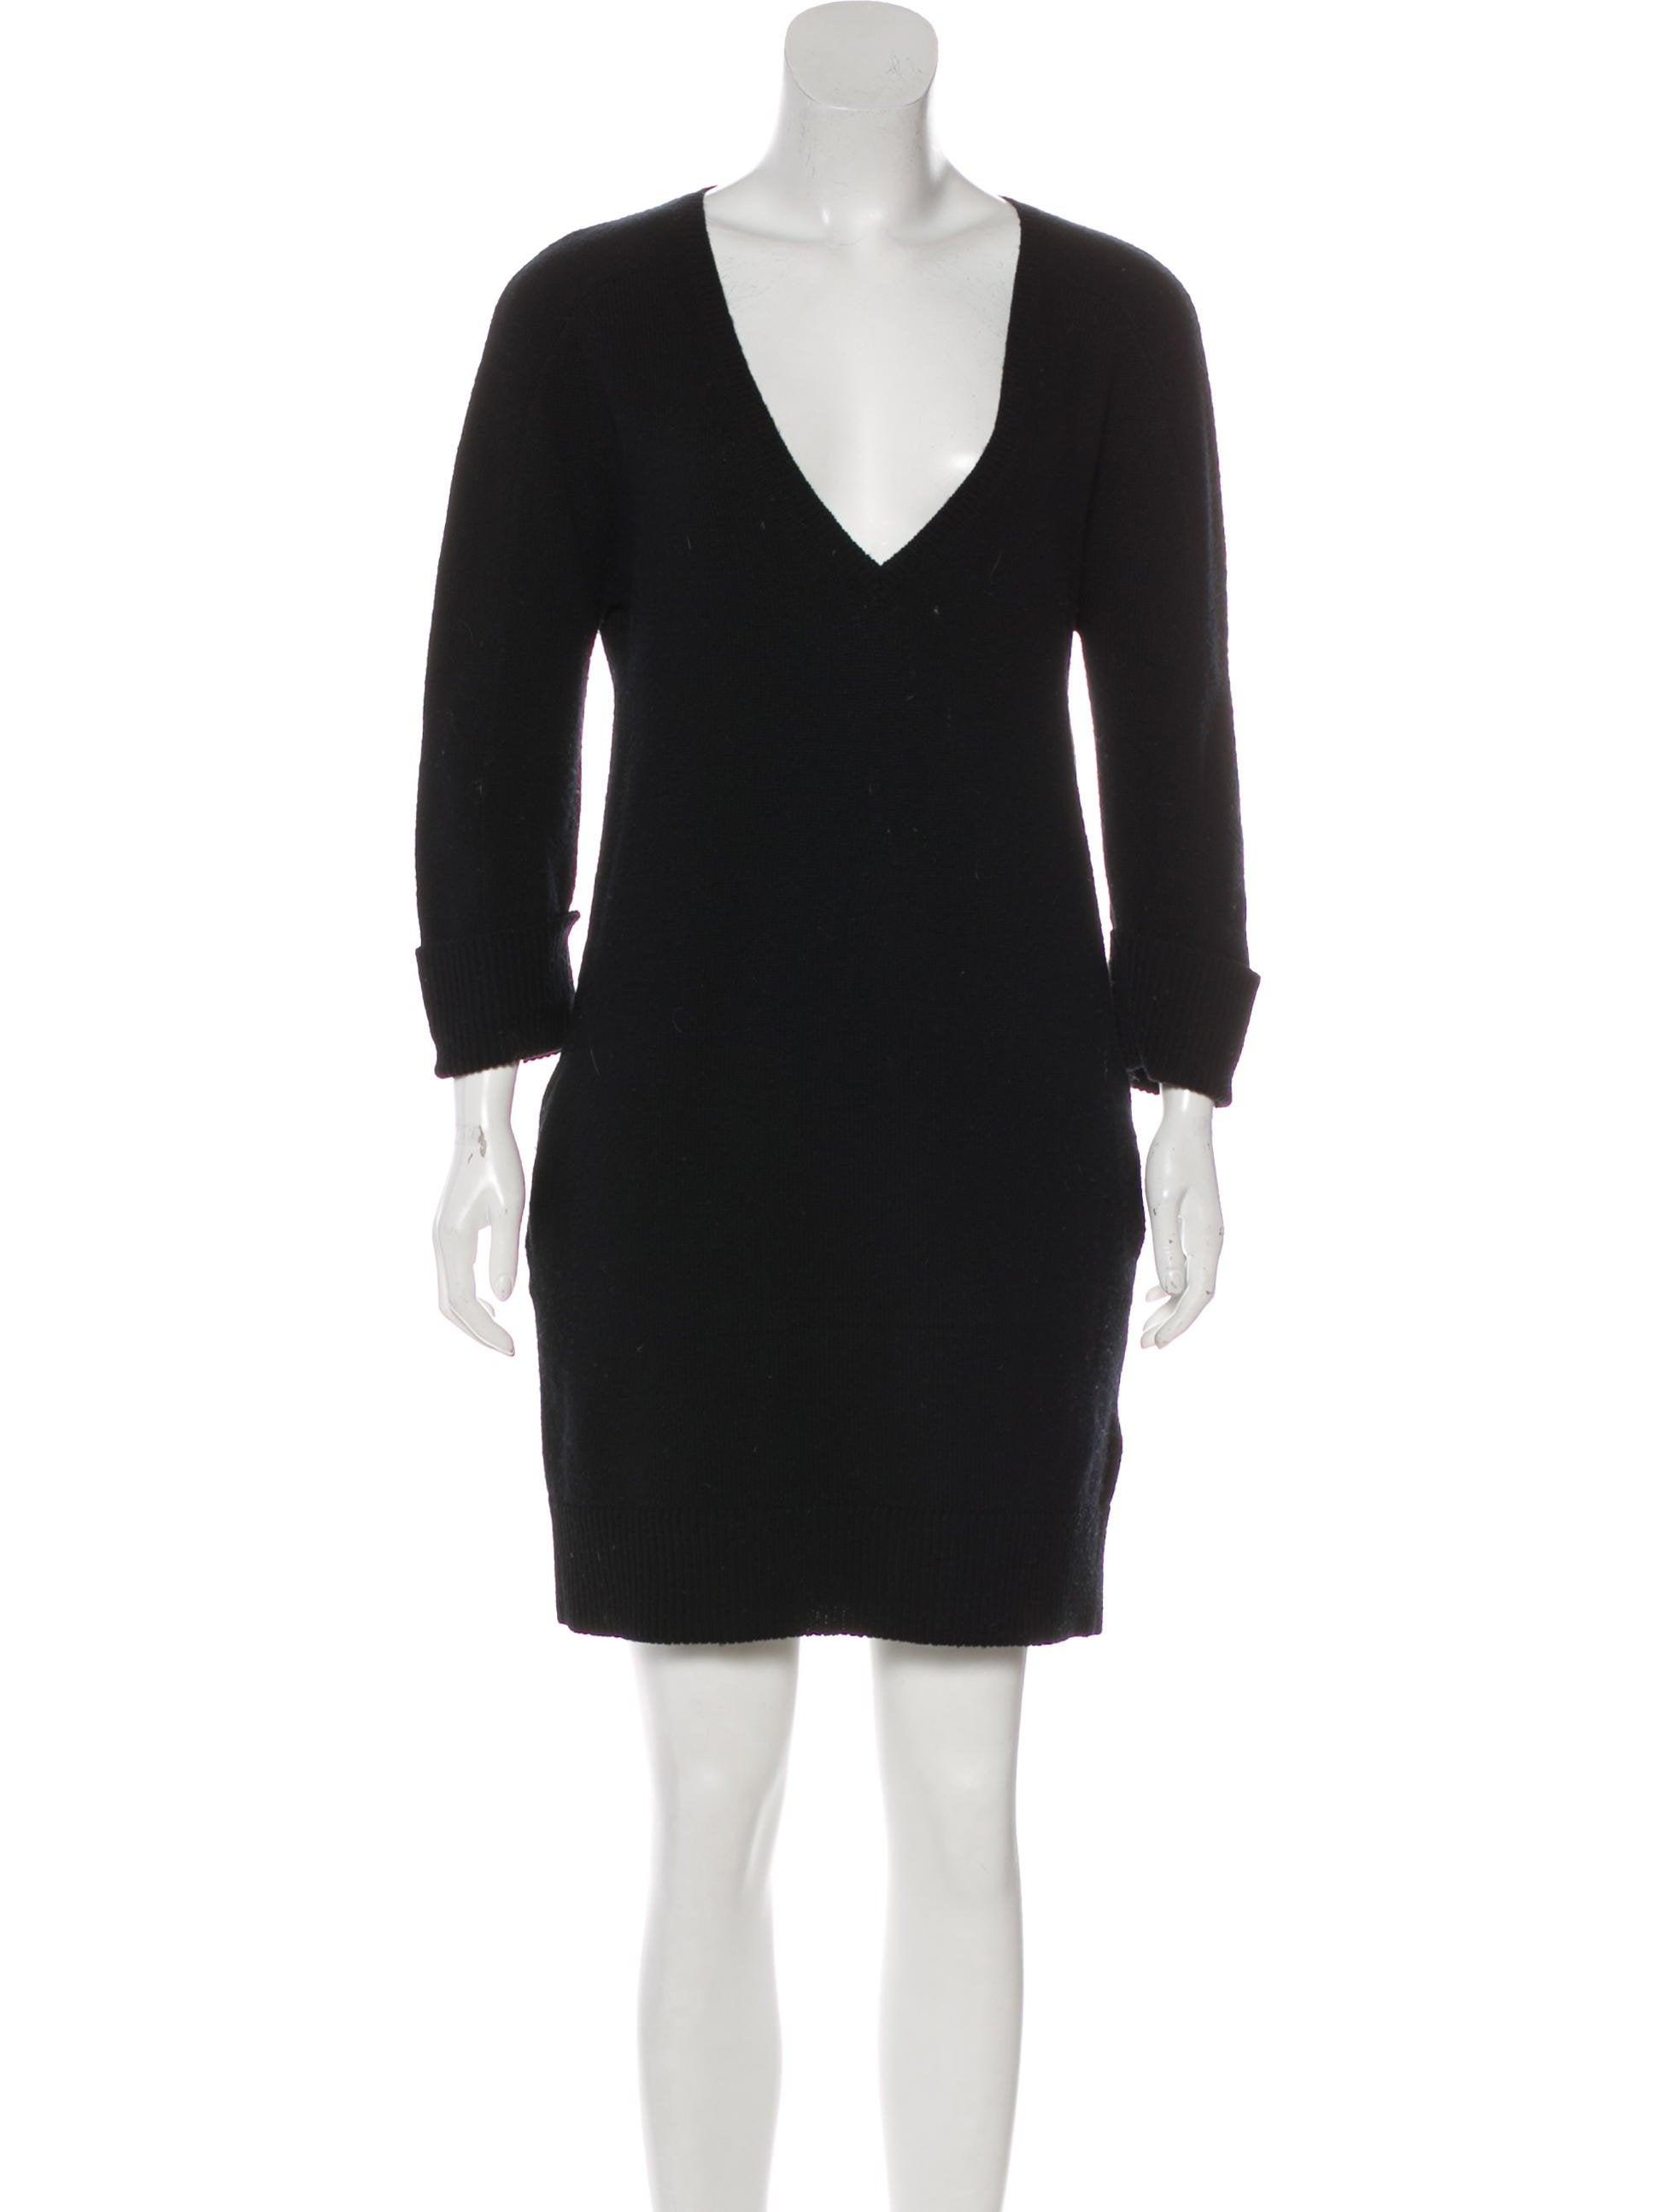 34b4918bc08 Chloé Cashmere Sweater Dress - Clothing - CHL91081